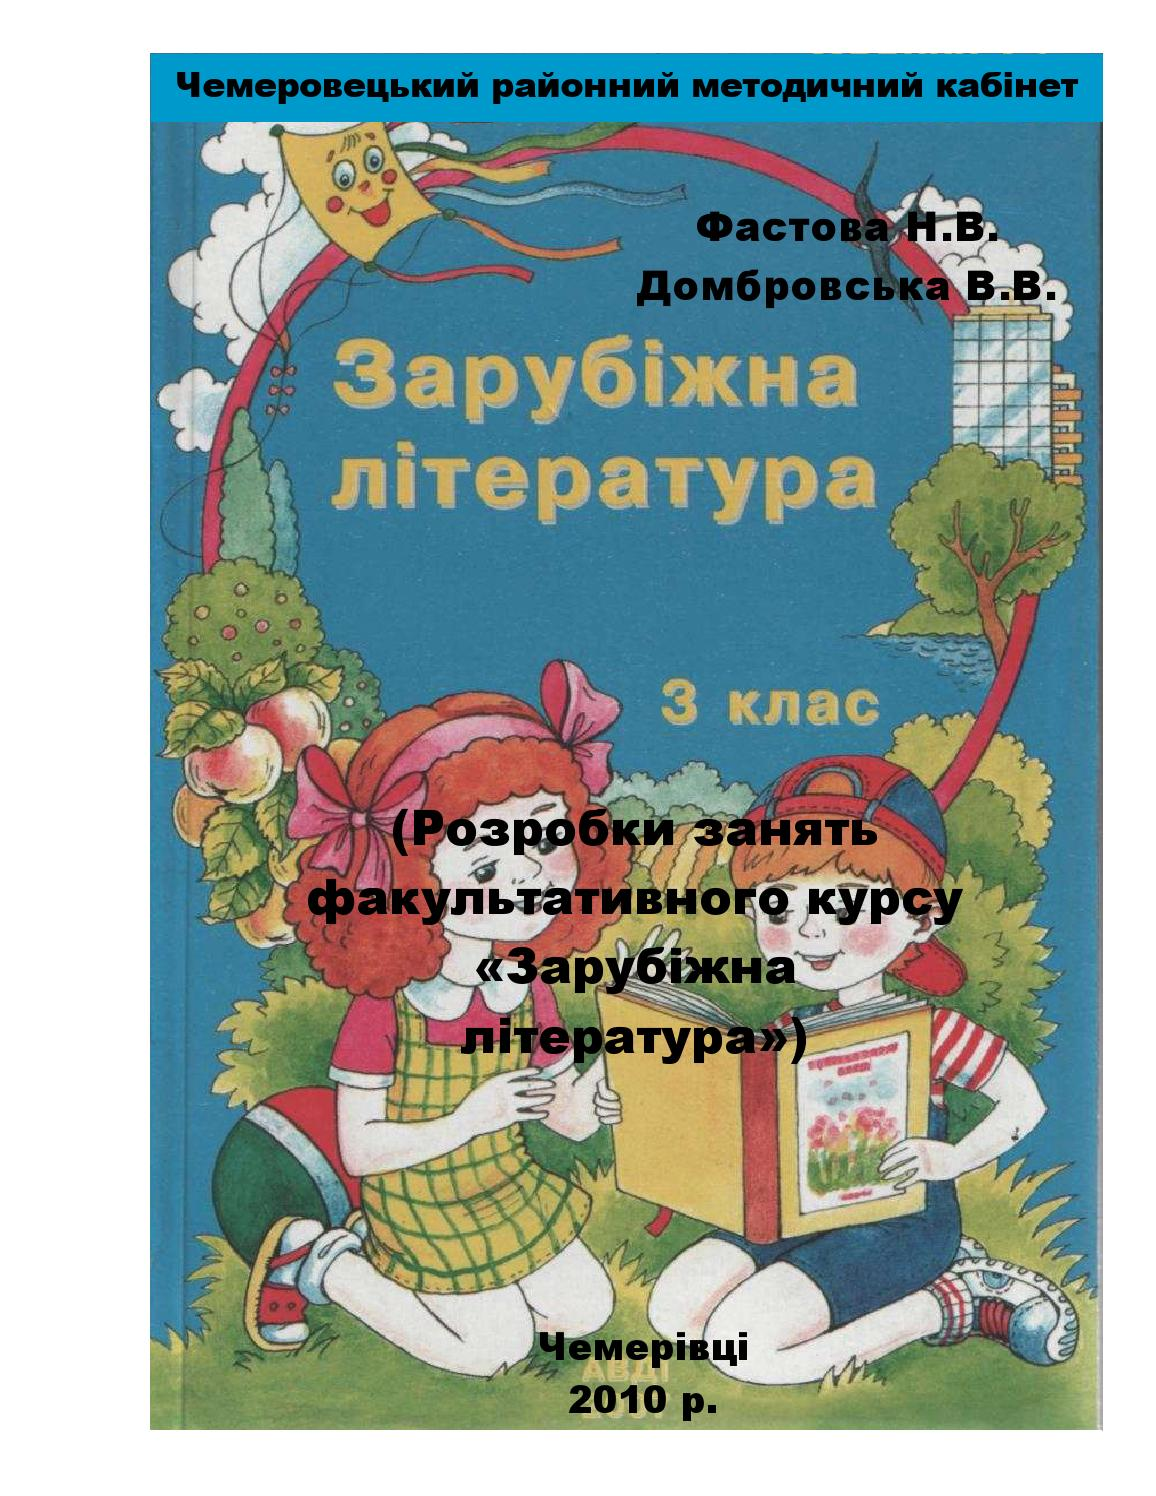 Зарубіжна література 3 клас методичний посібник by Yura Pagor - issuu 47a5ffca4d1fa